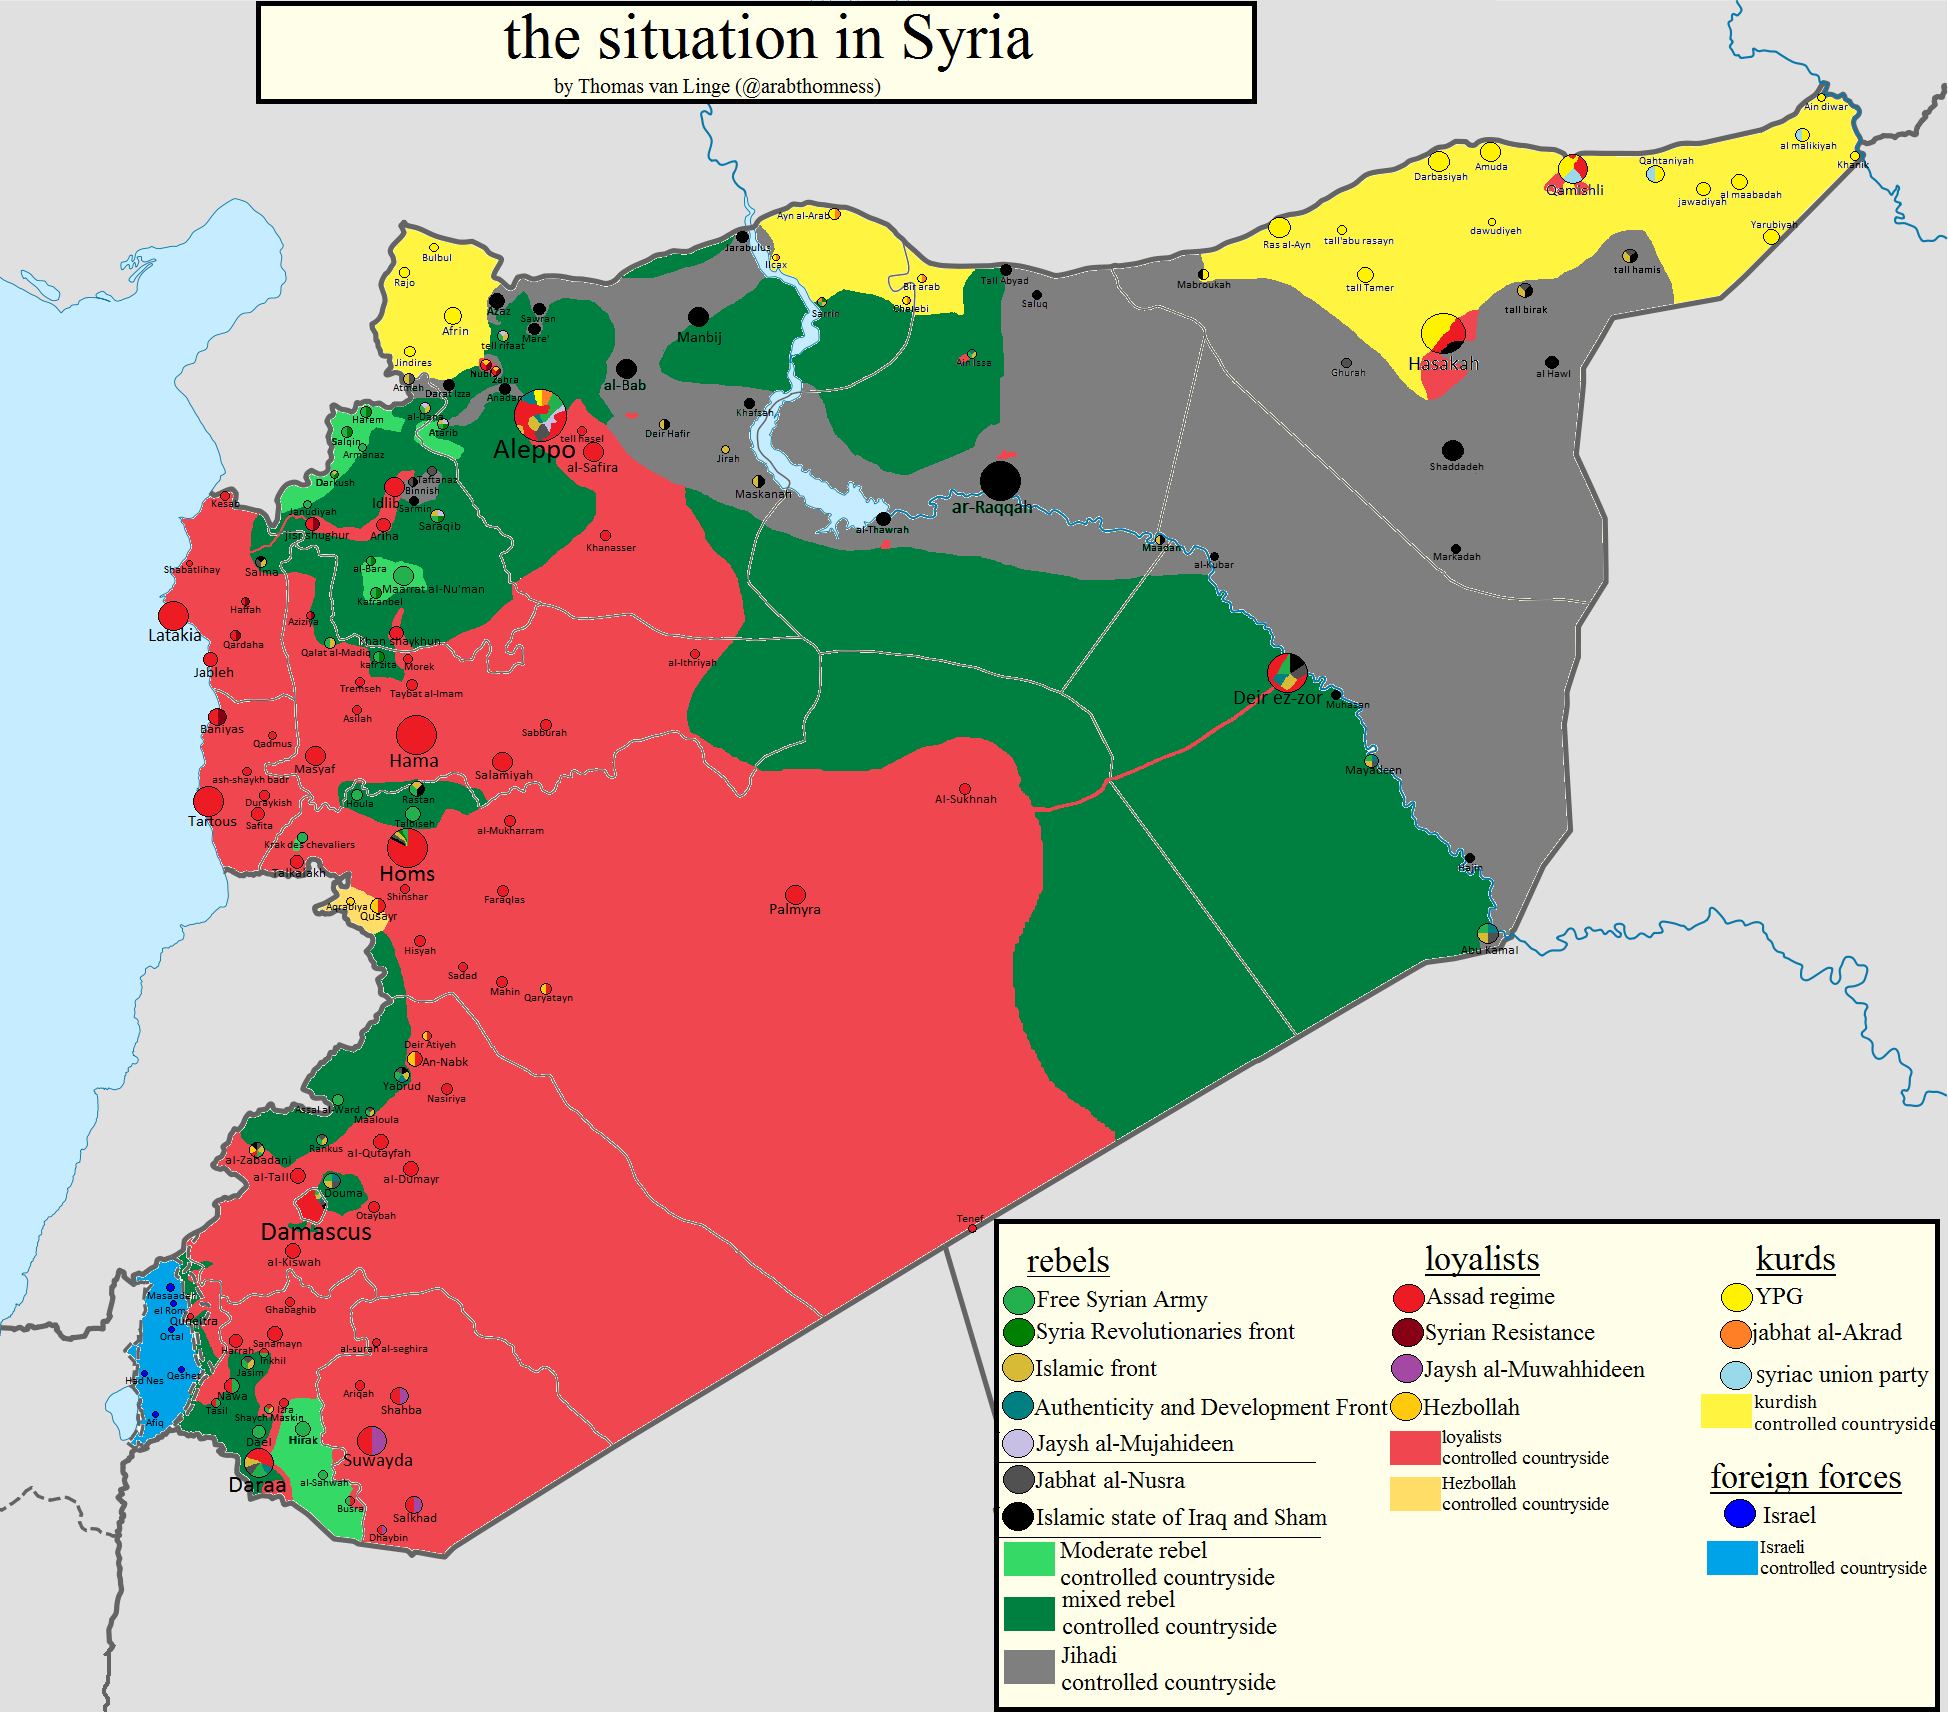 Situation des forces en Syrie